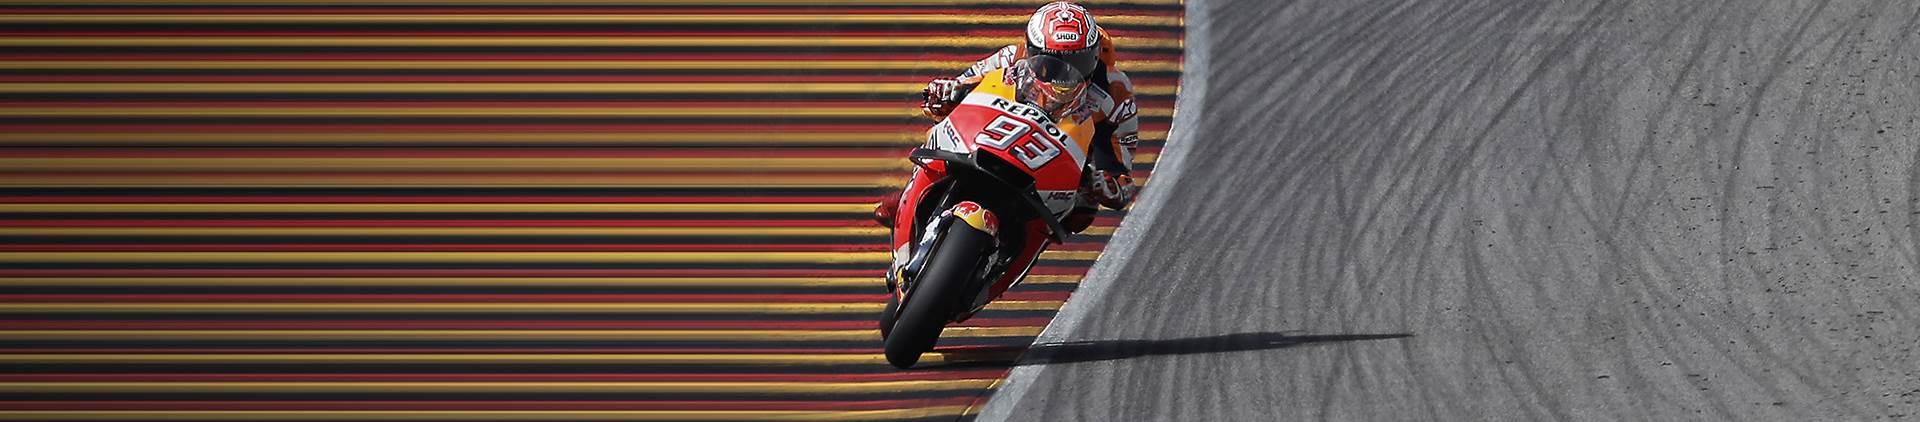 MotoGP Deutschland